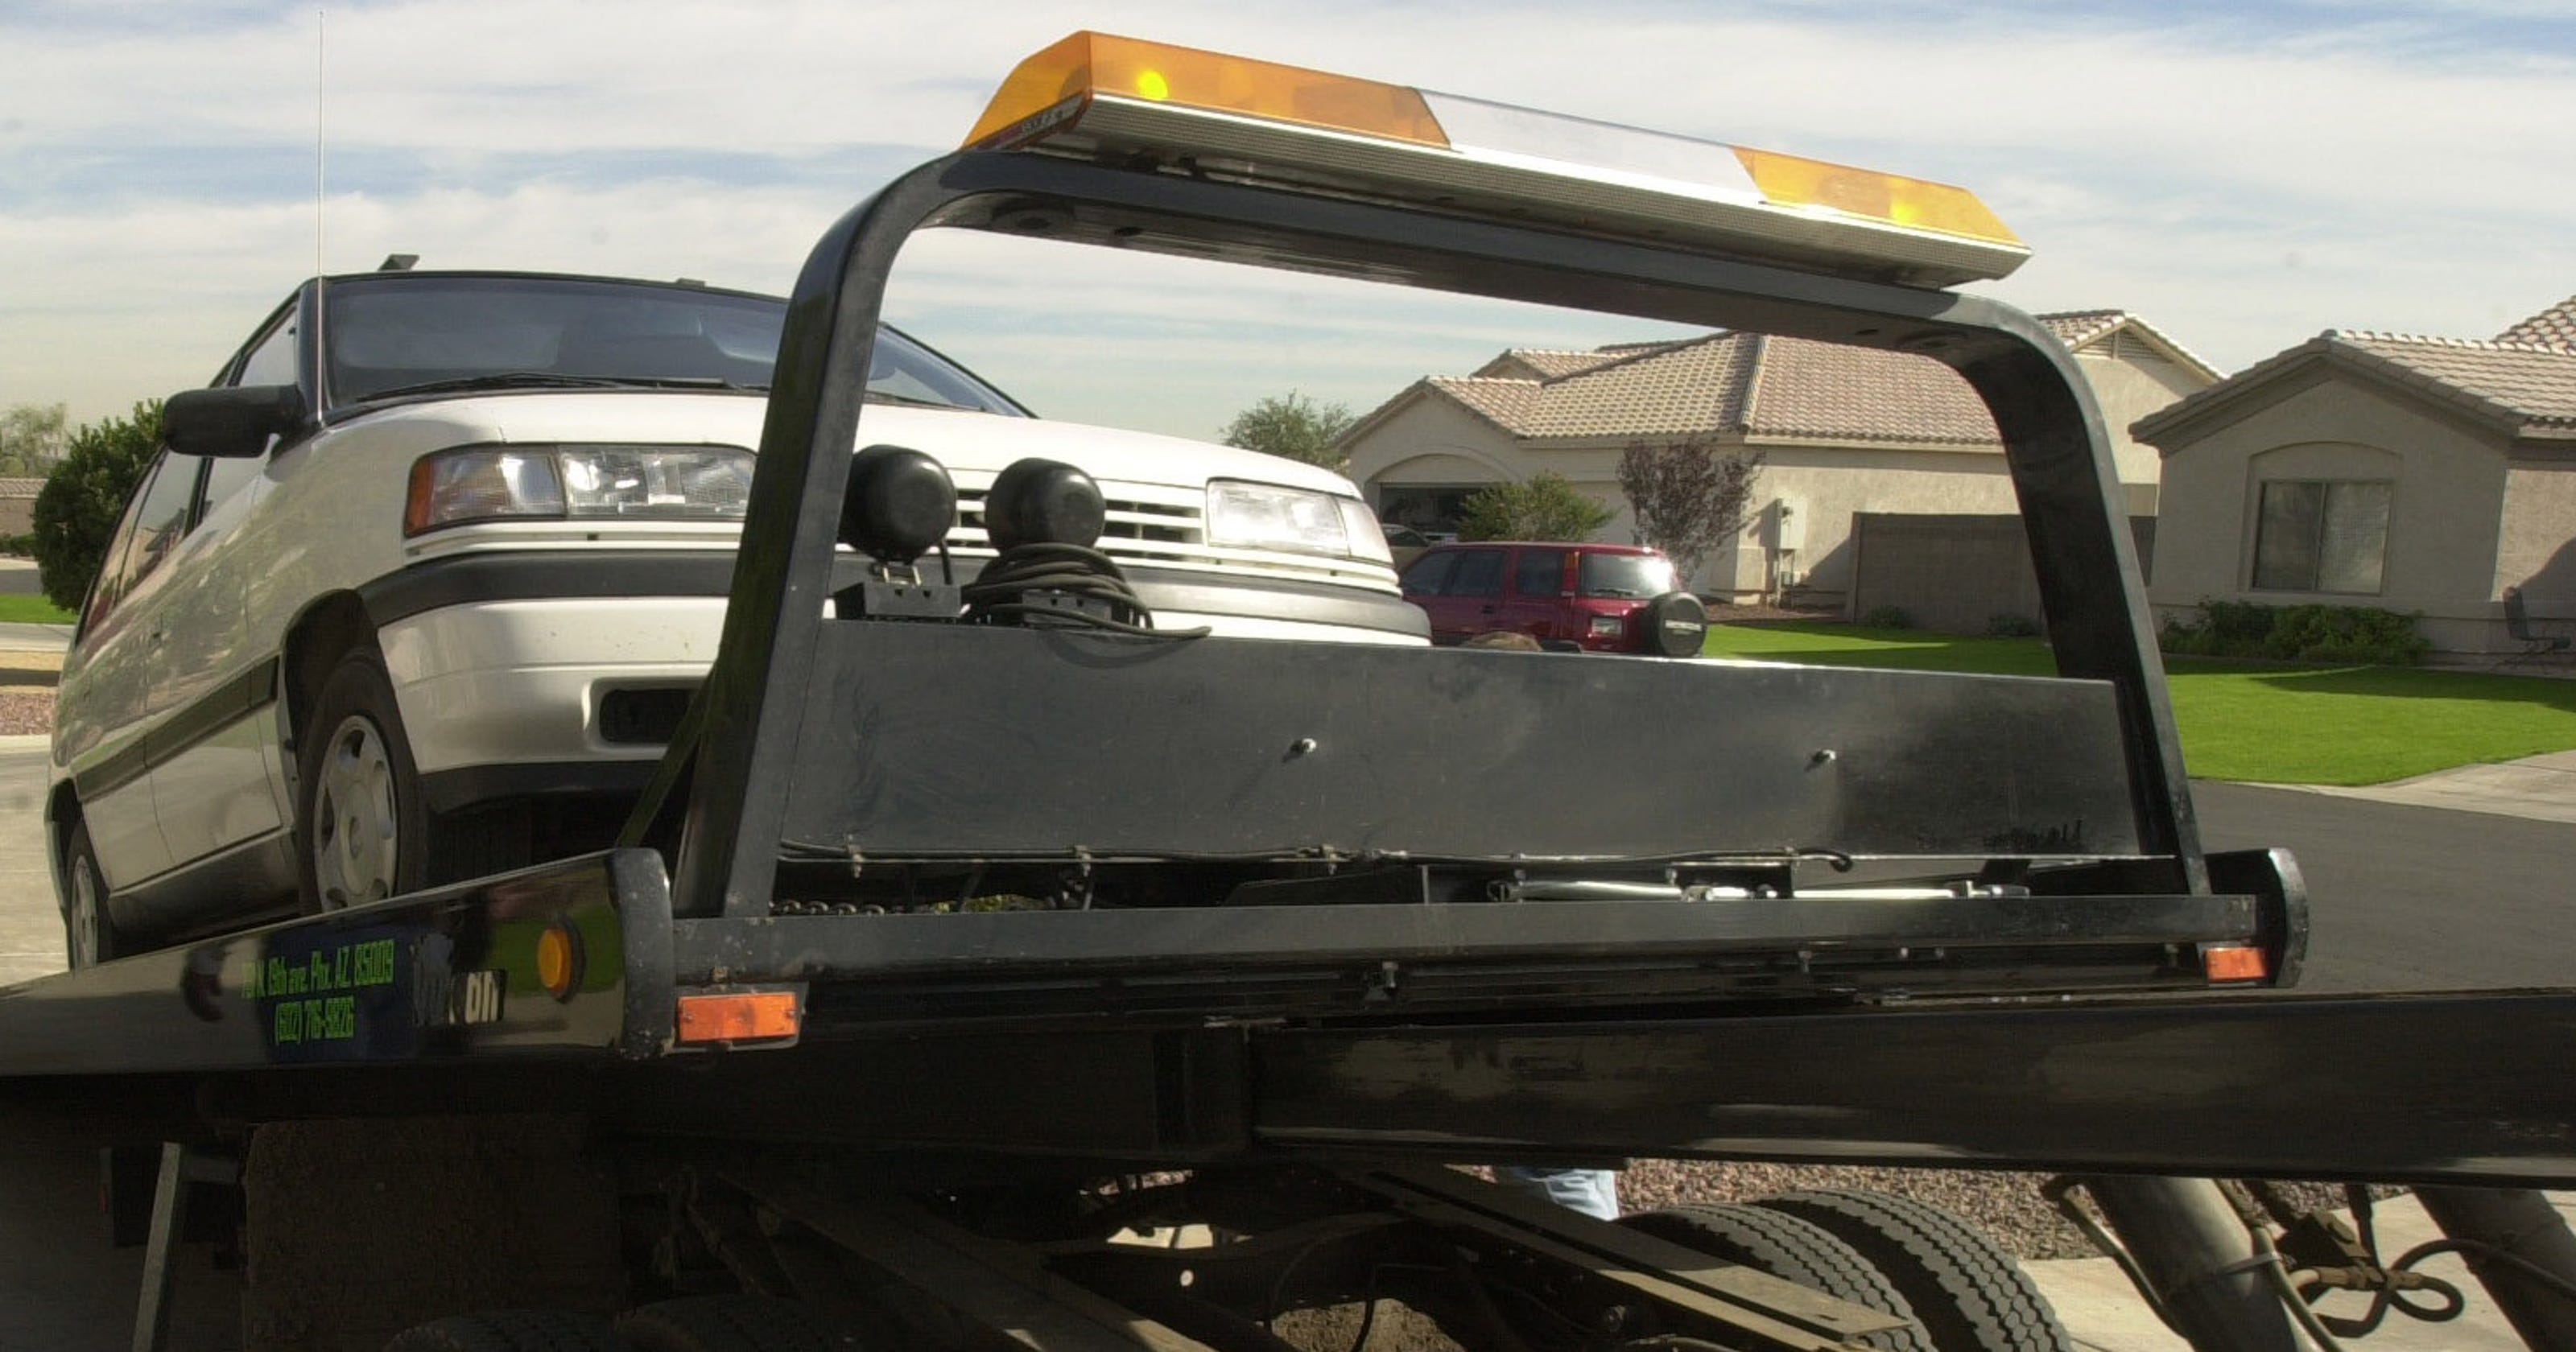 New Arizona law cracks down on bad towing companies